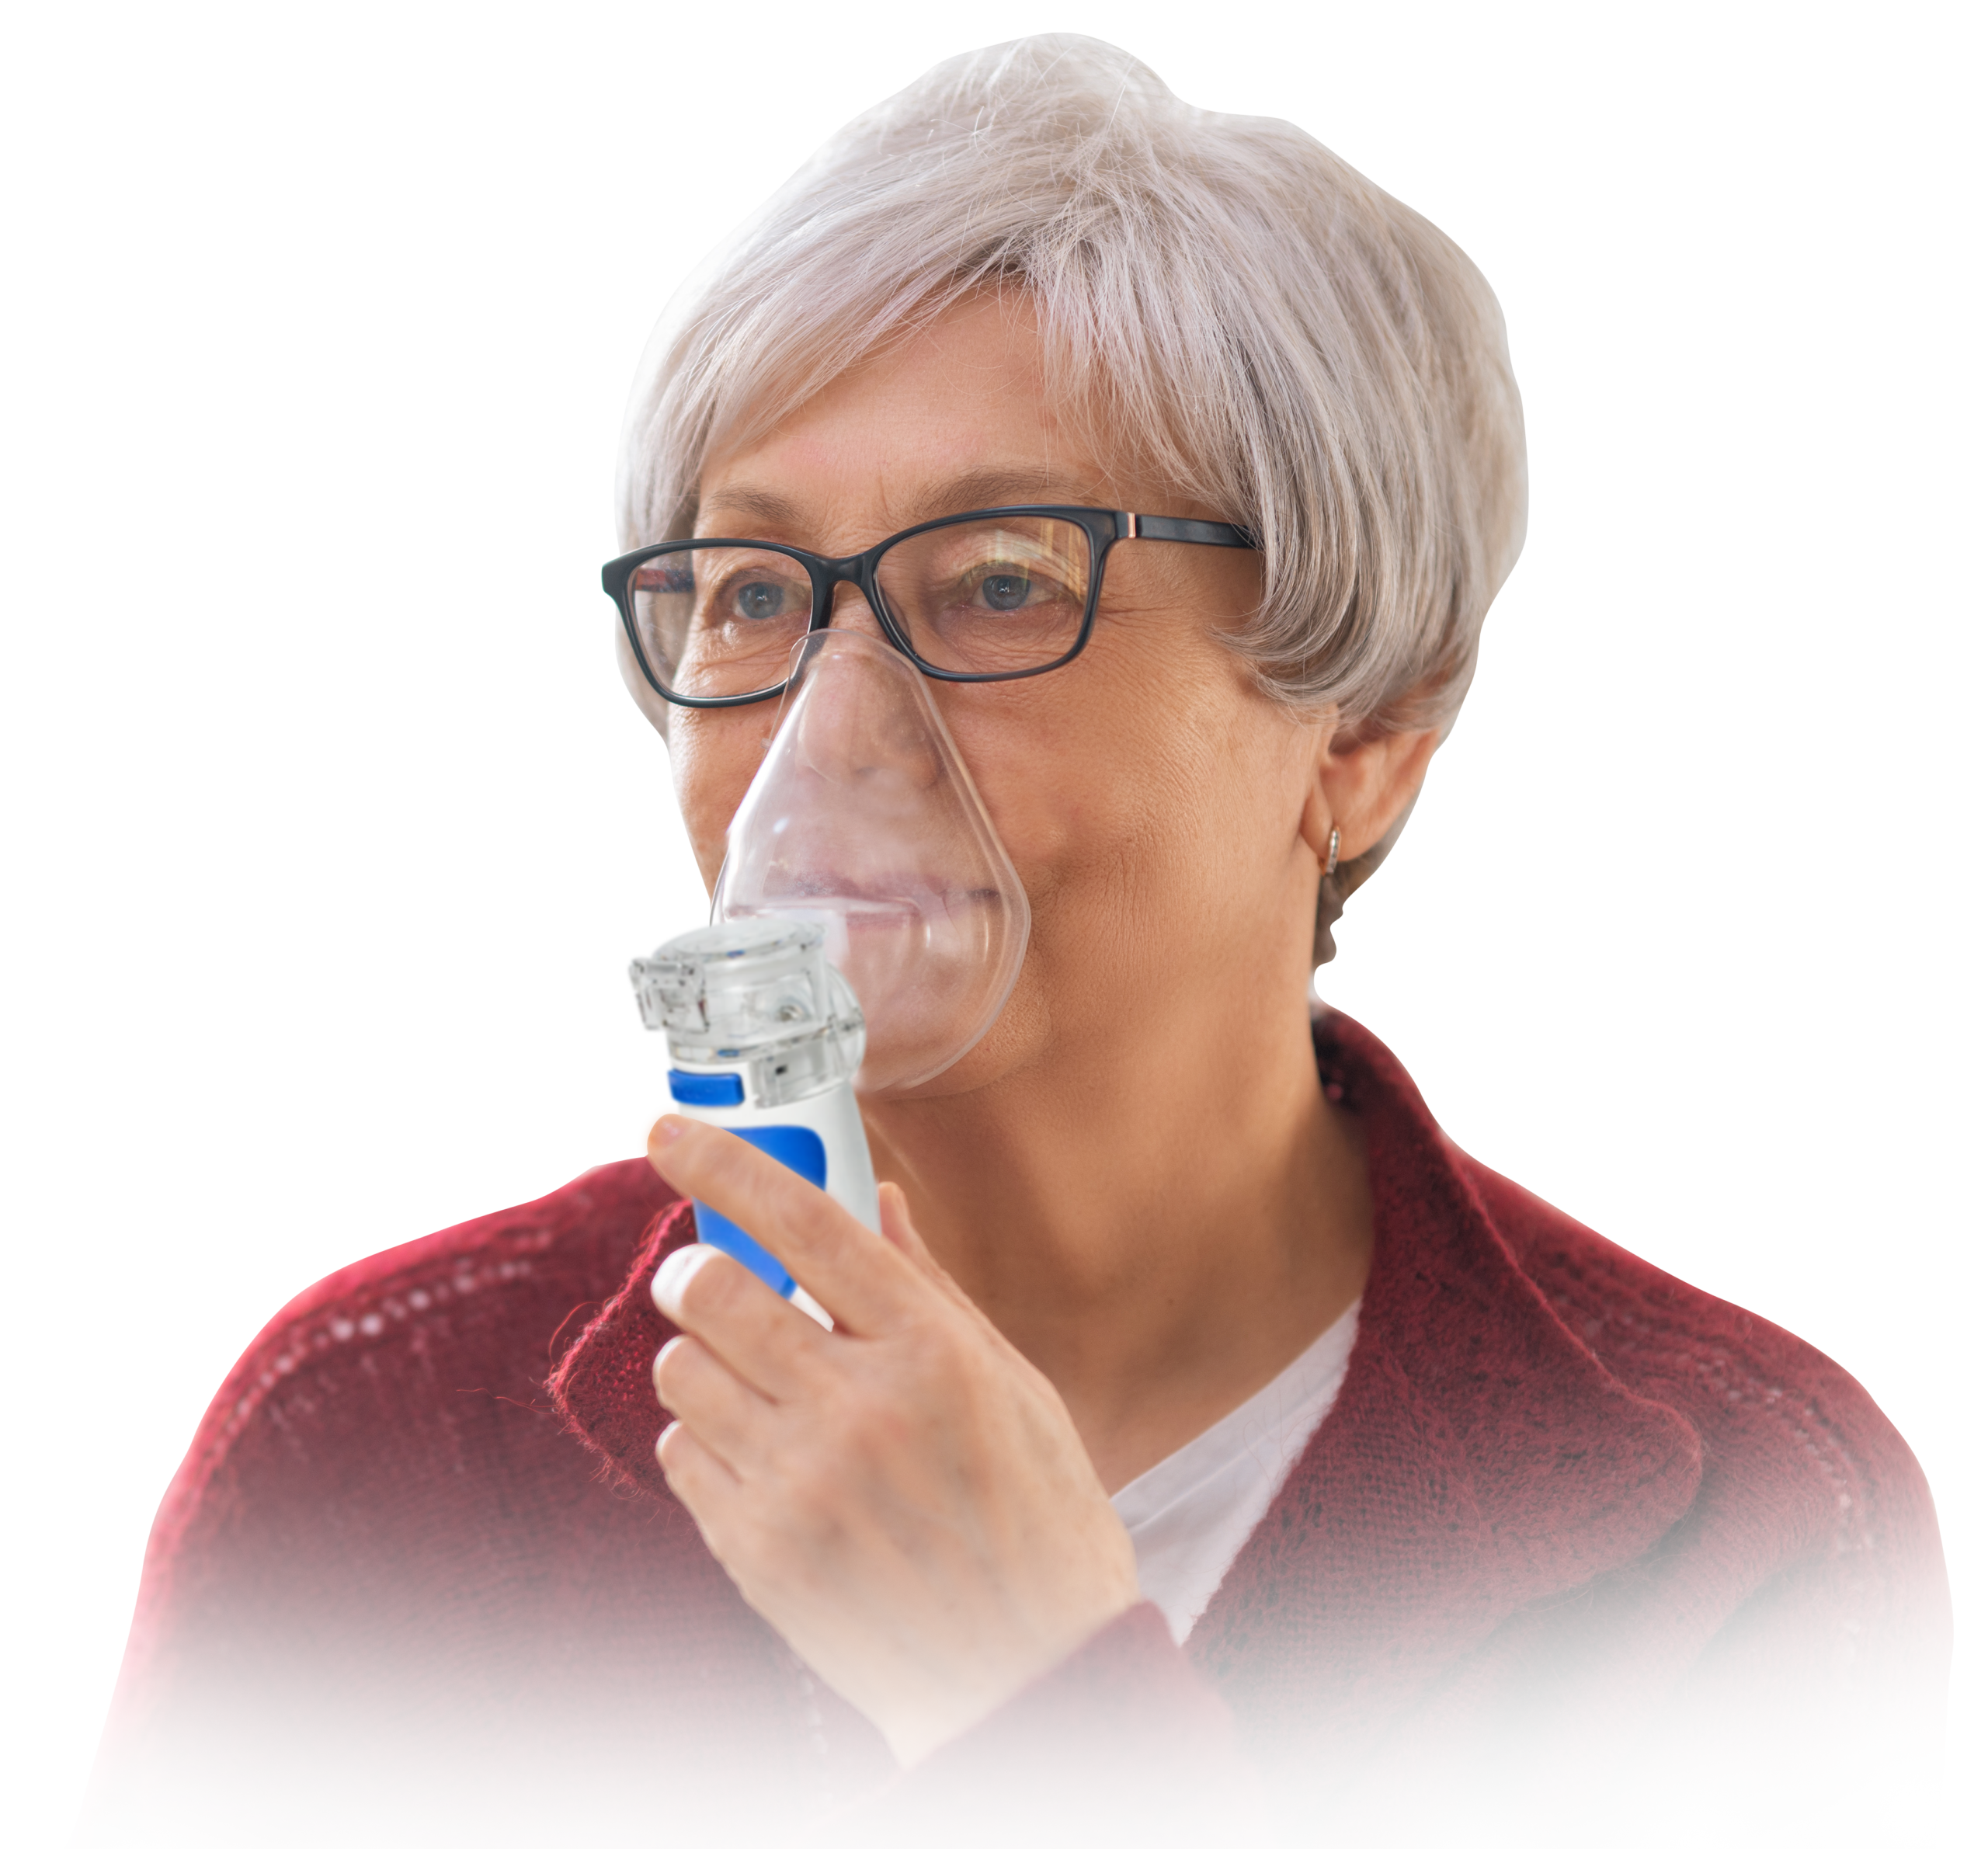 Lady using TruNeb Portable Nebulizer Machine in & near Lakeland, FL